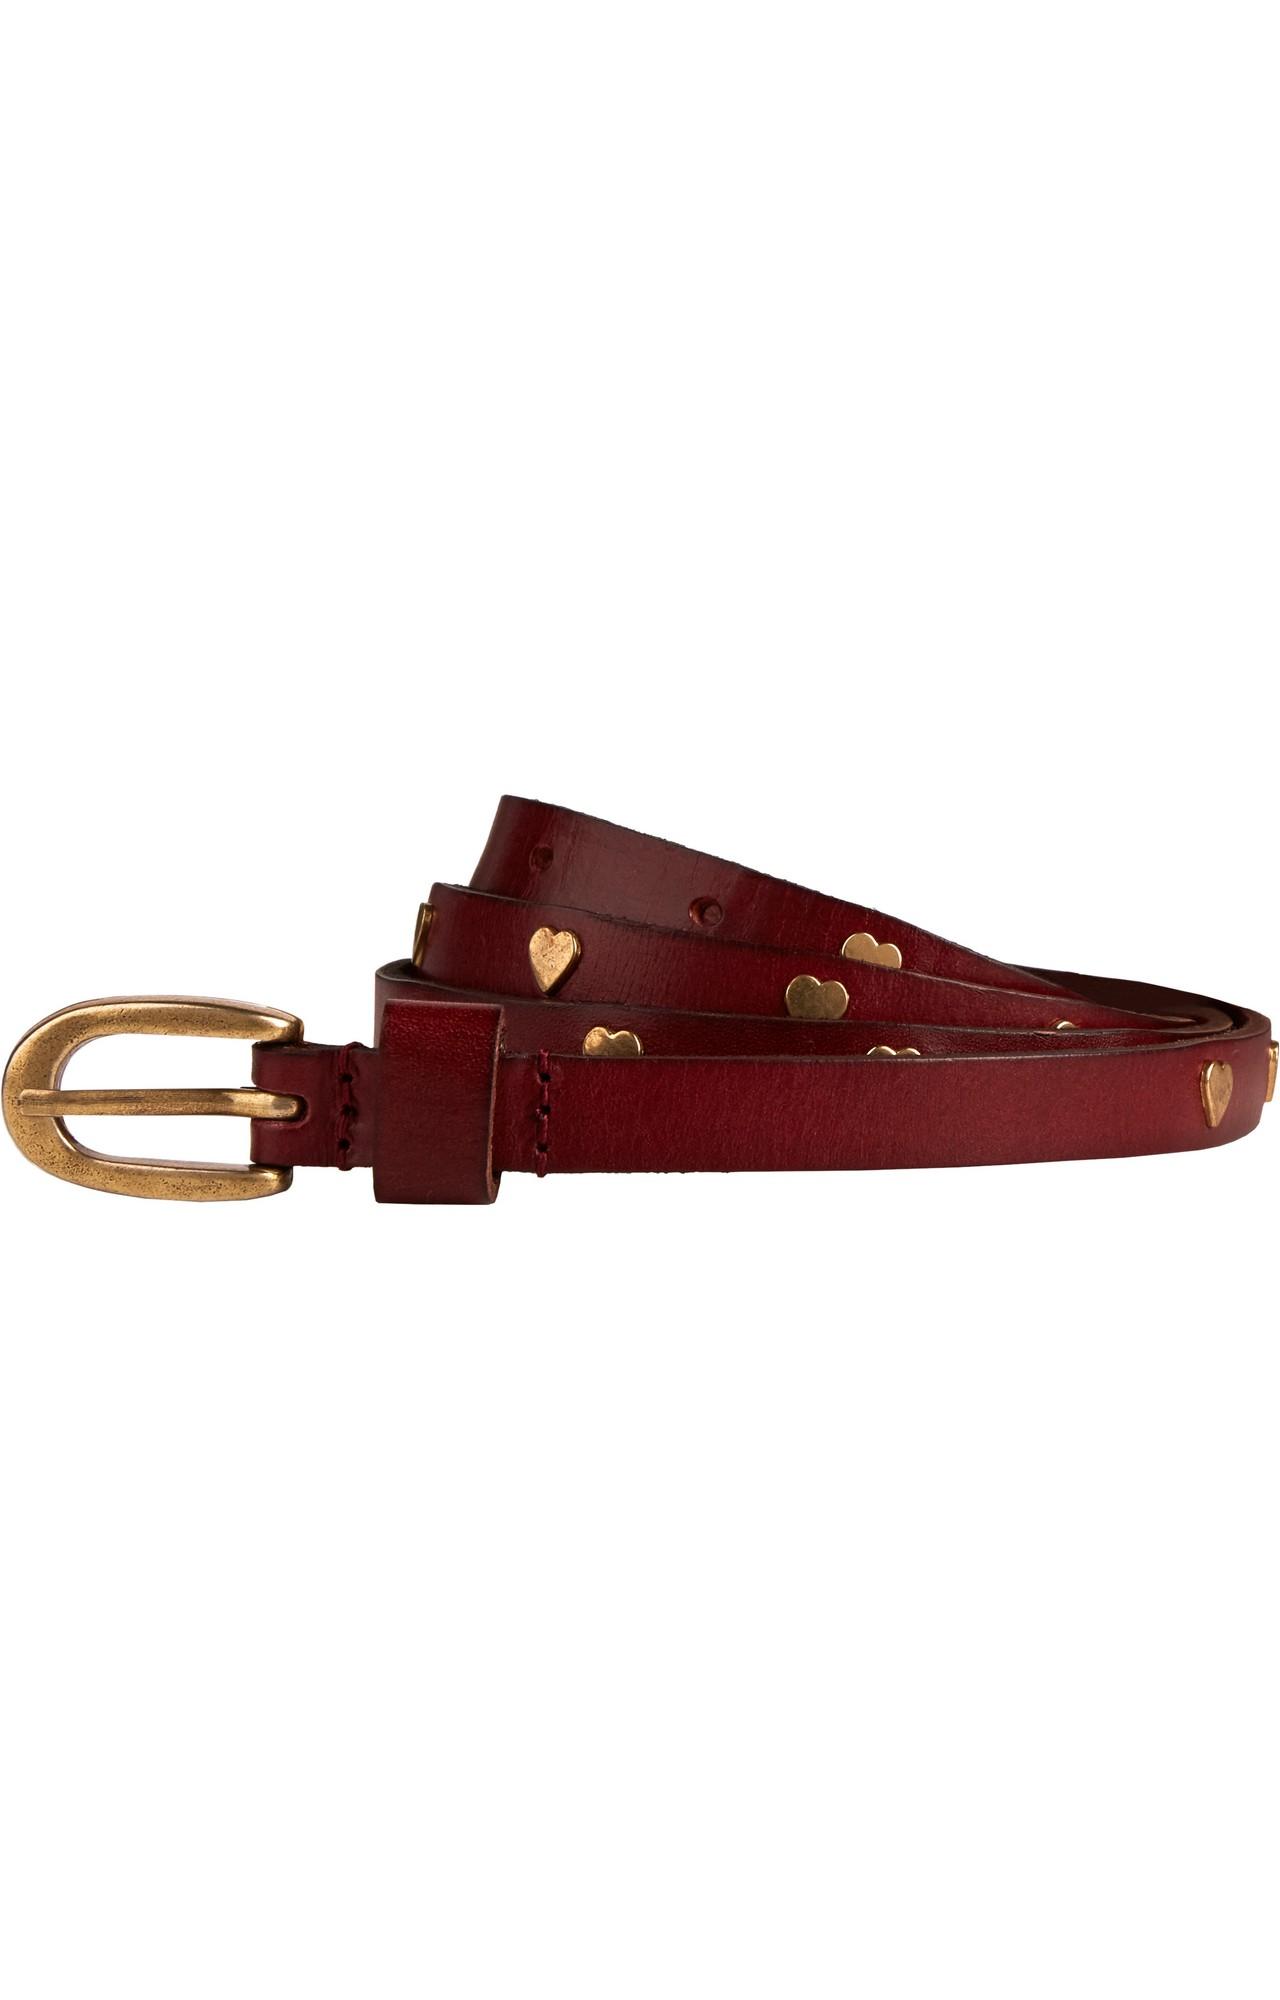 Scotch & Soda | thin leather belts with studs